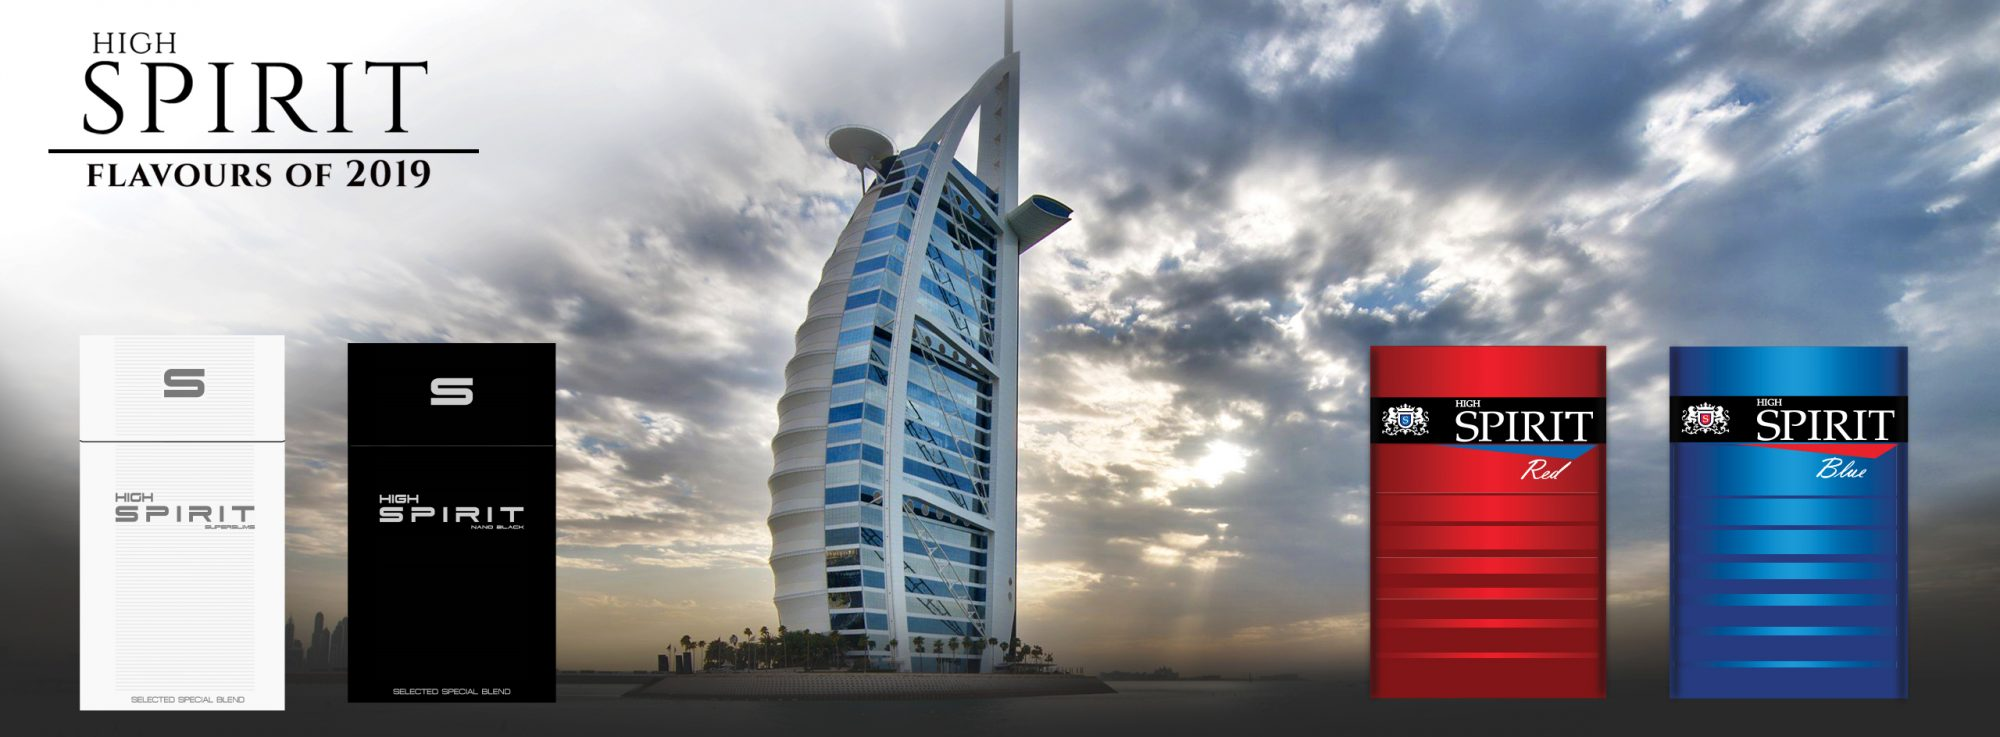 Cigarette Machinery Supplier, Trader & Manufacturer in Dubai